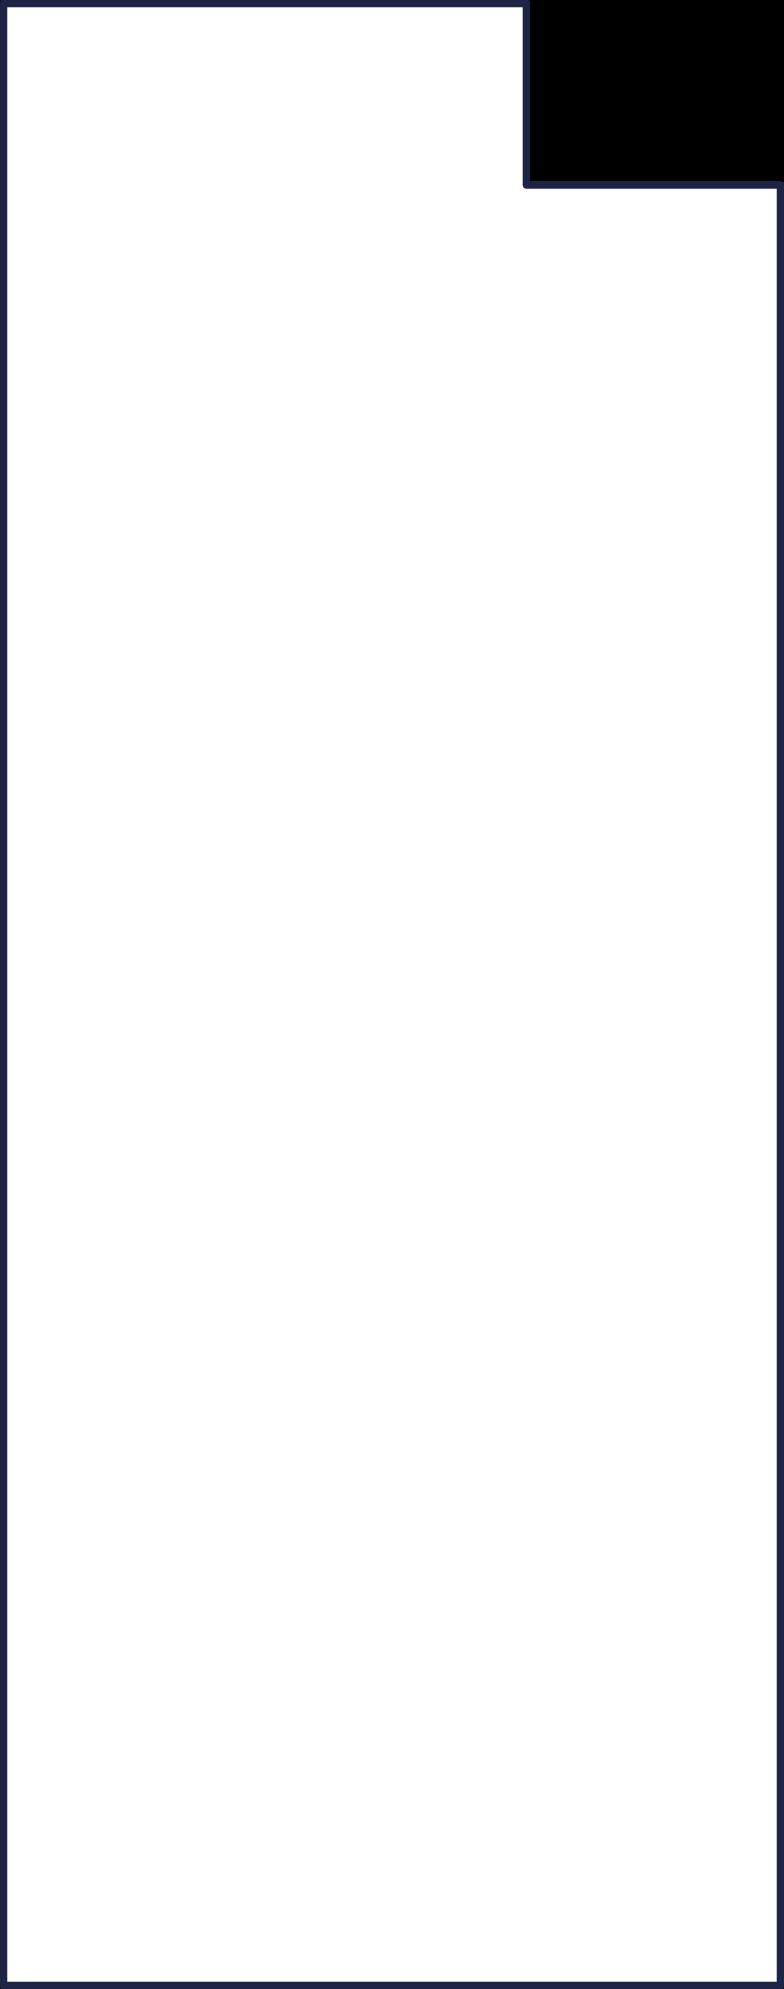 premium upgrade  building 2 line Clipart-Grafik als PNG, SVG